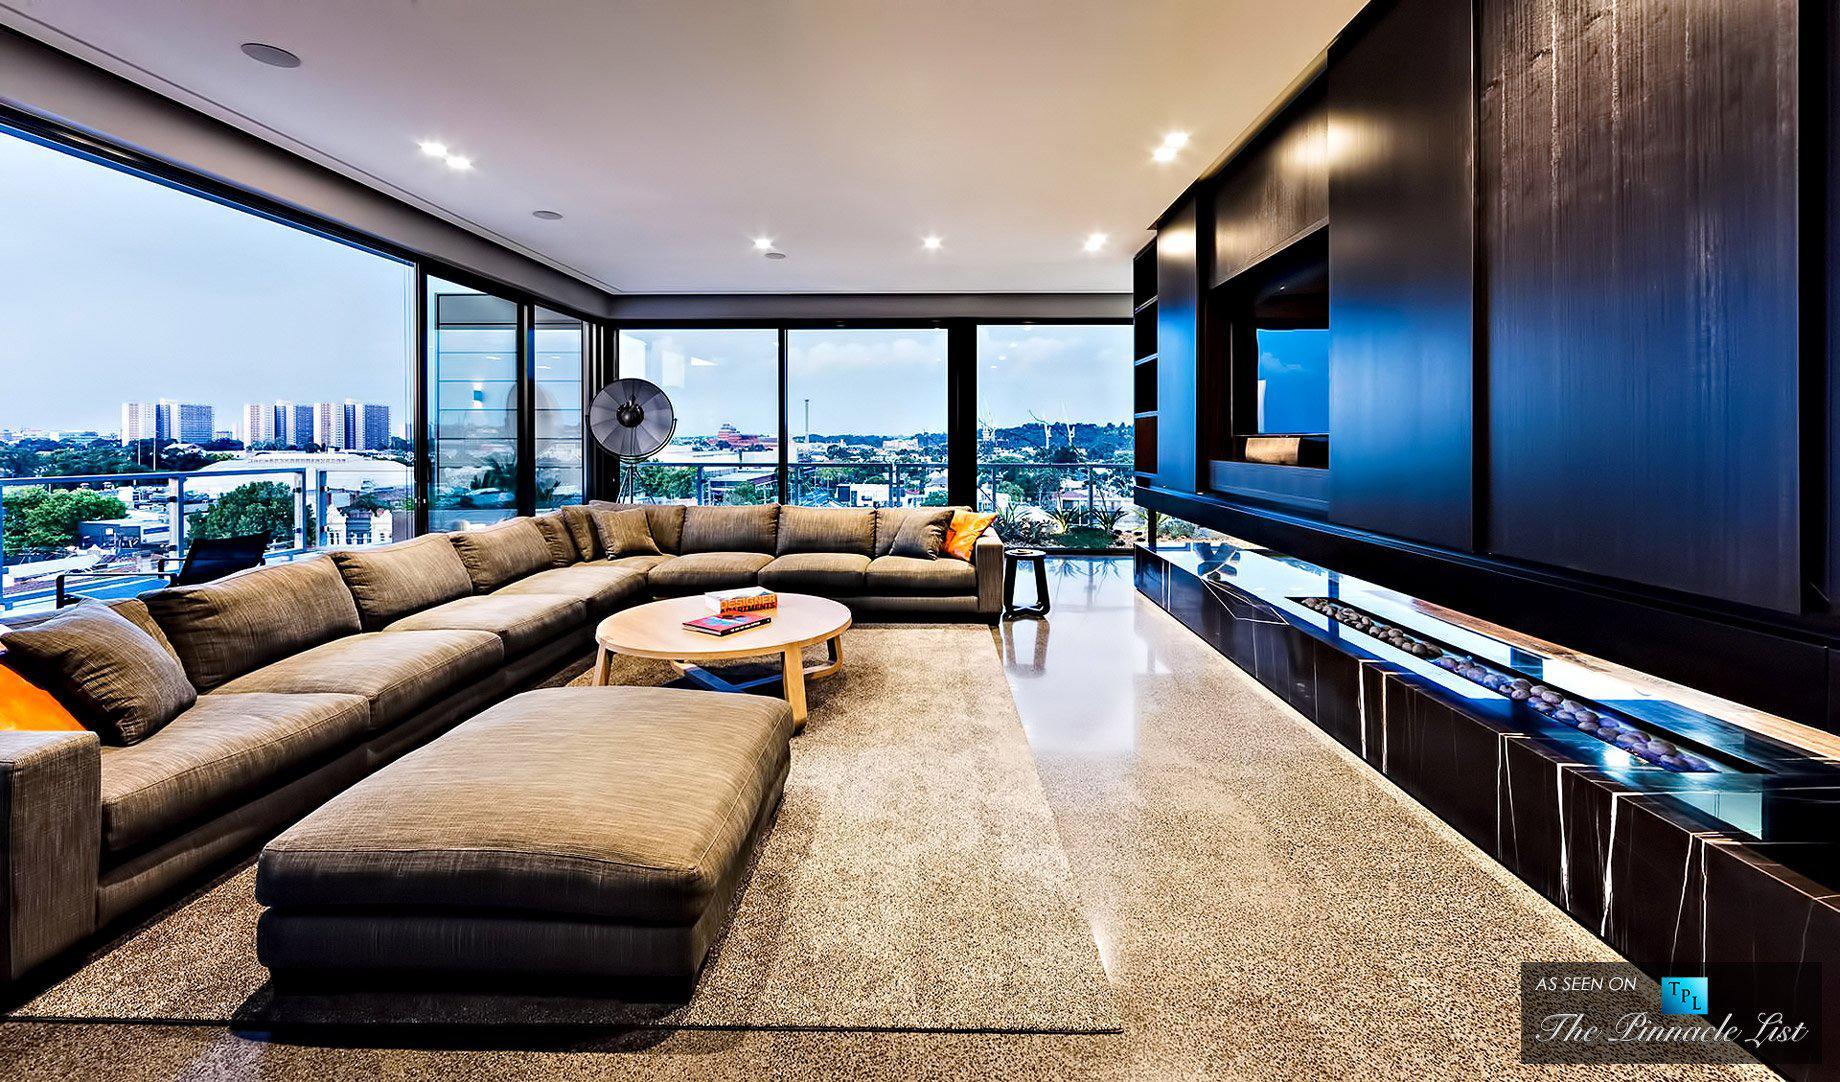 HD Interior Design Room House Home Apartment Condo 169